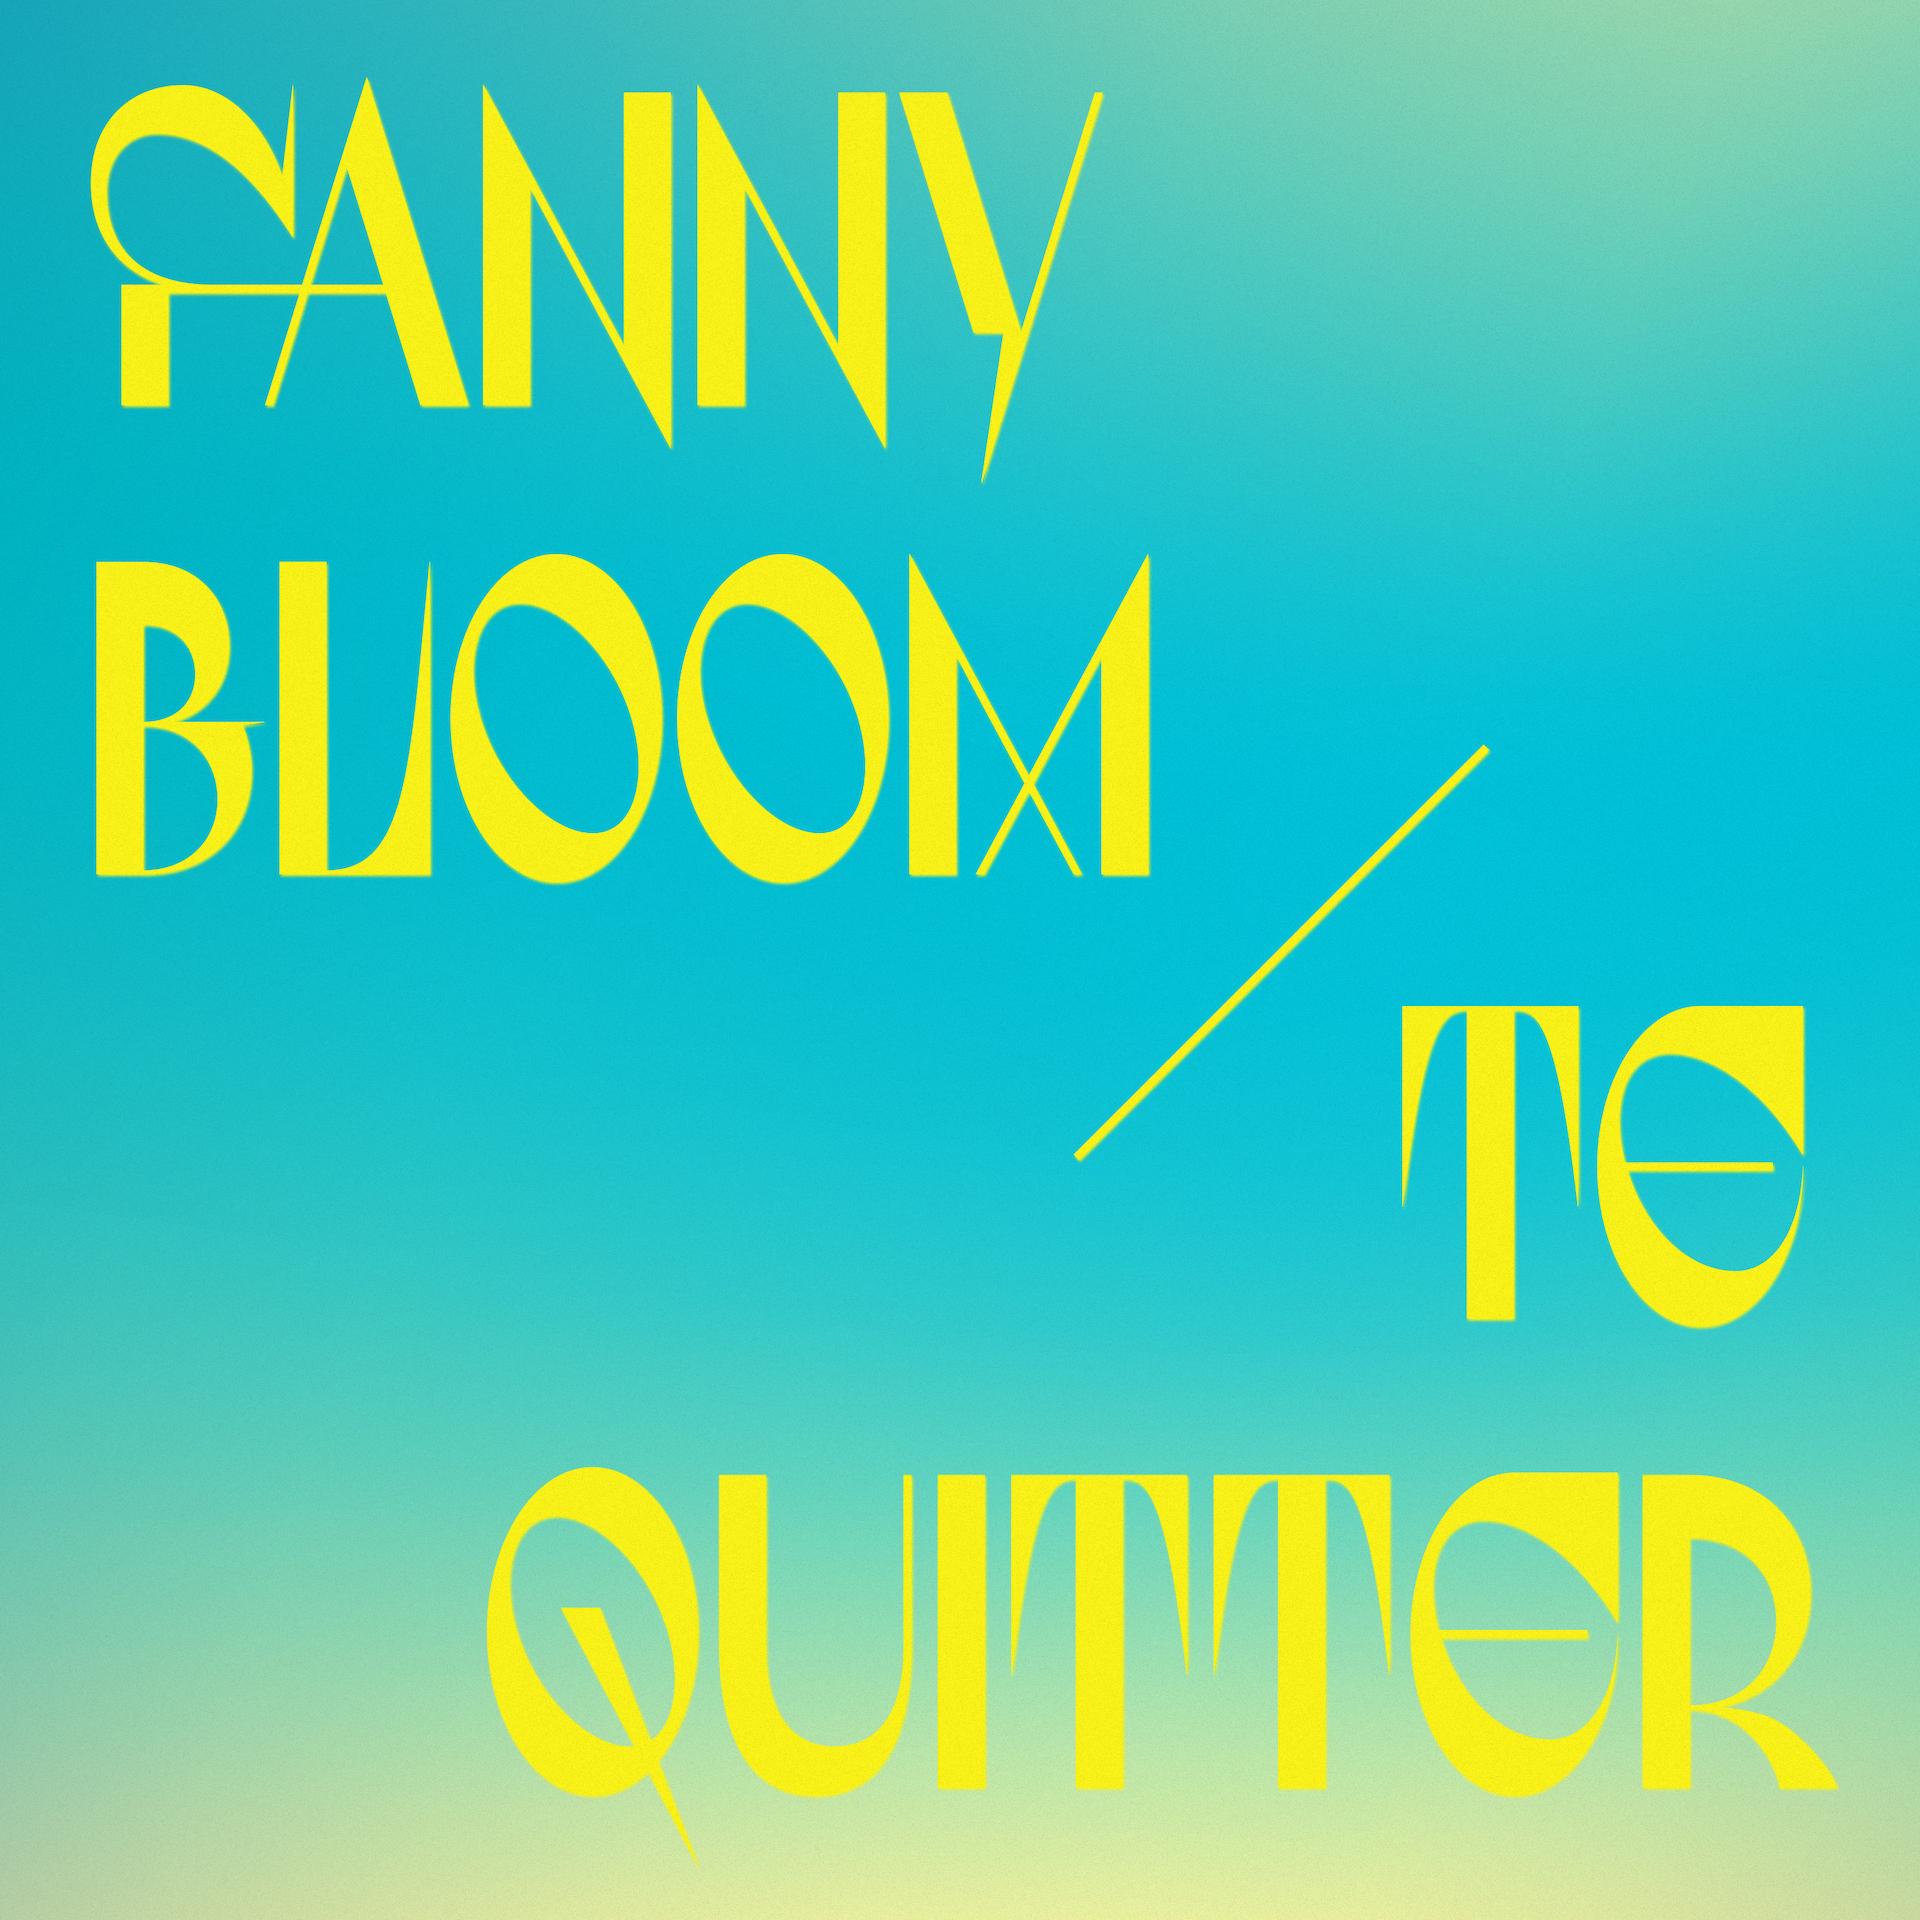 Te quitter (single)